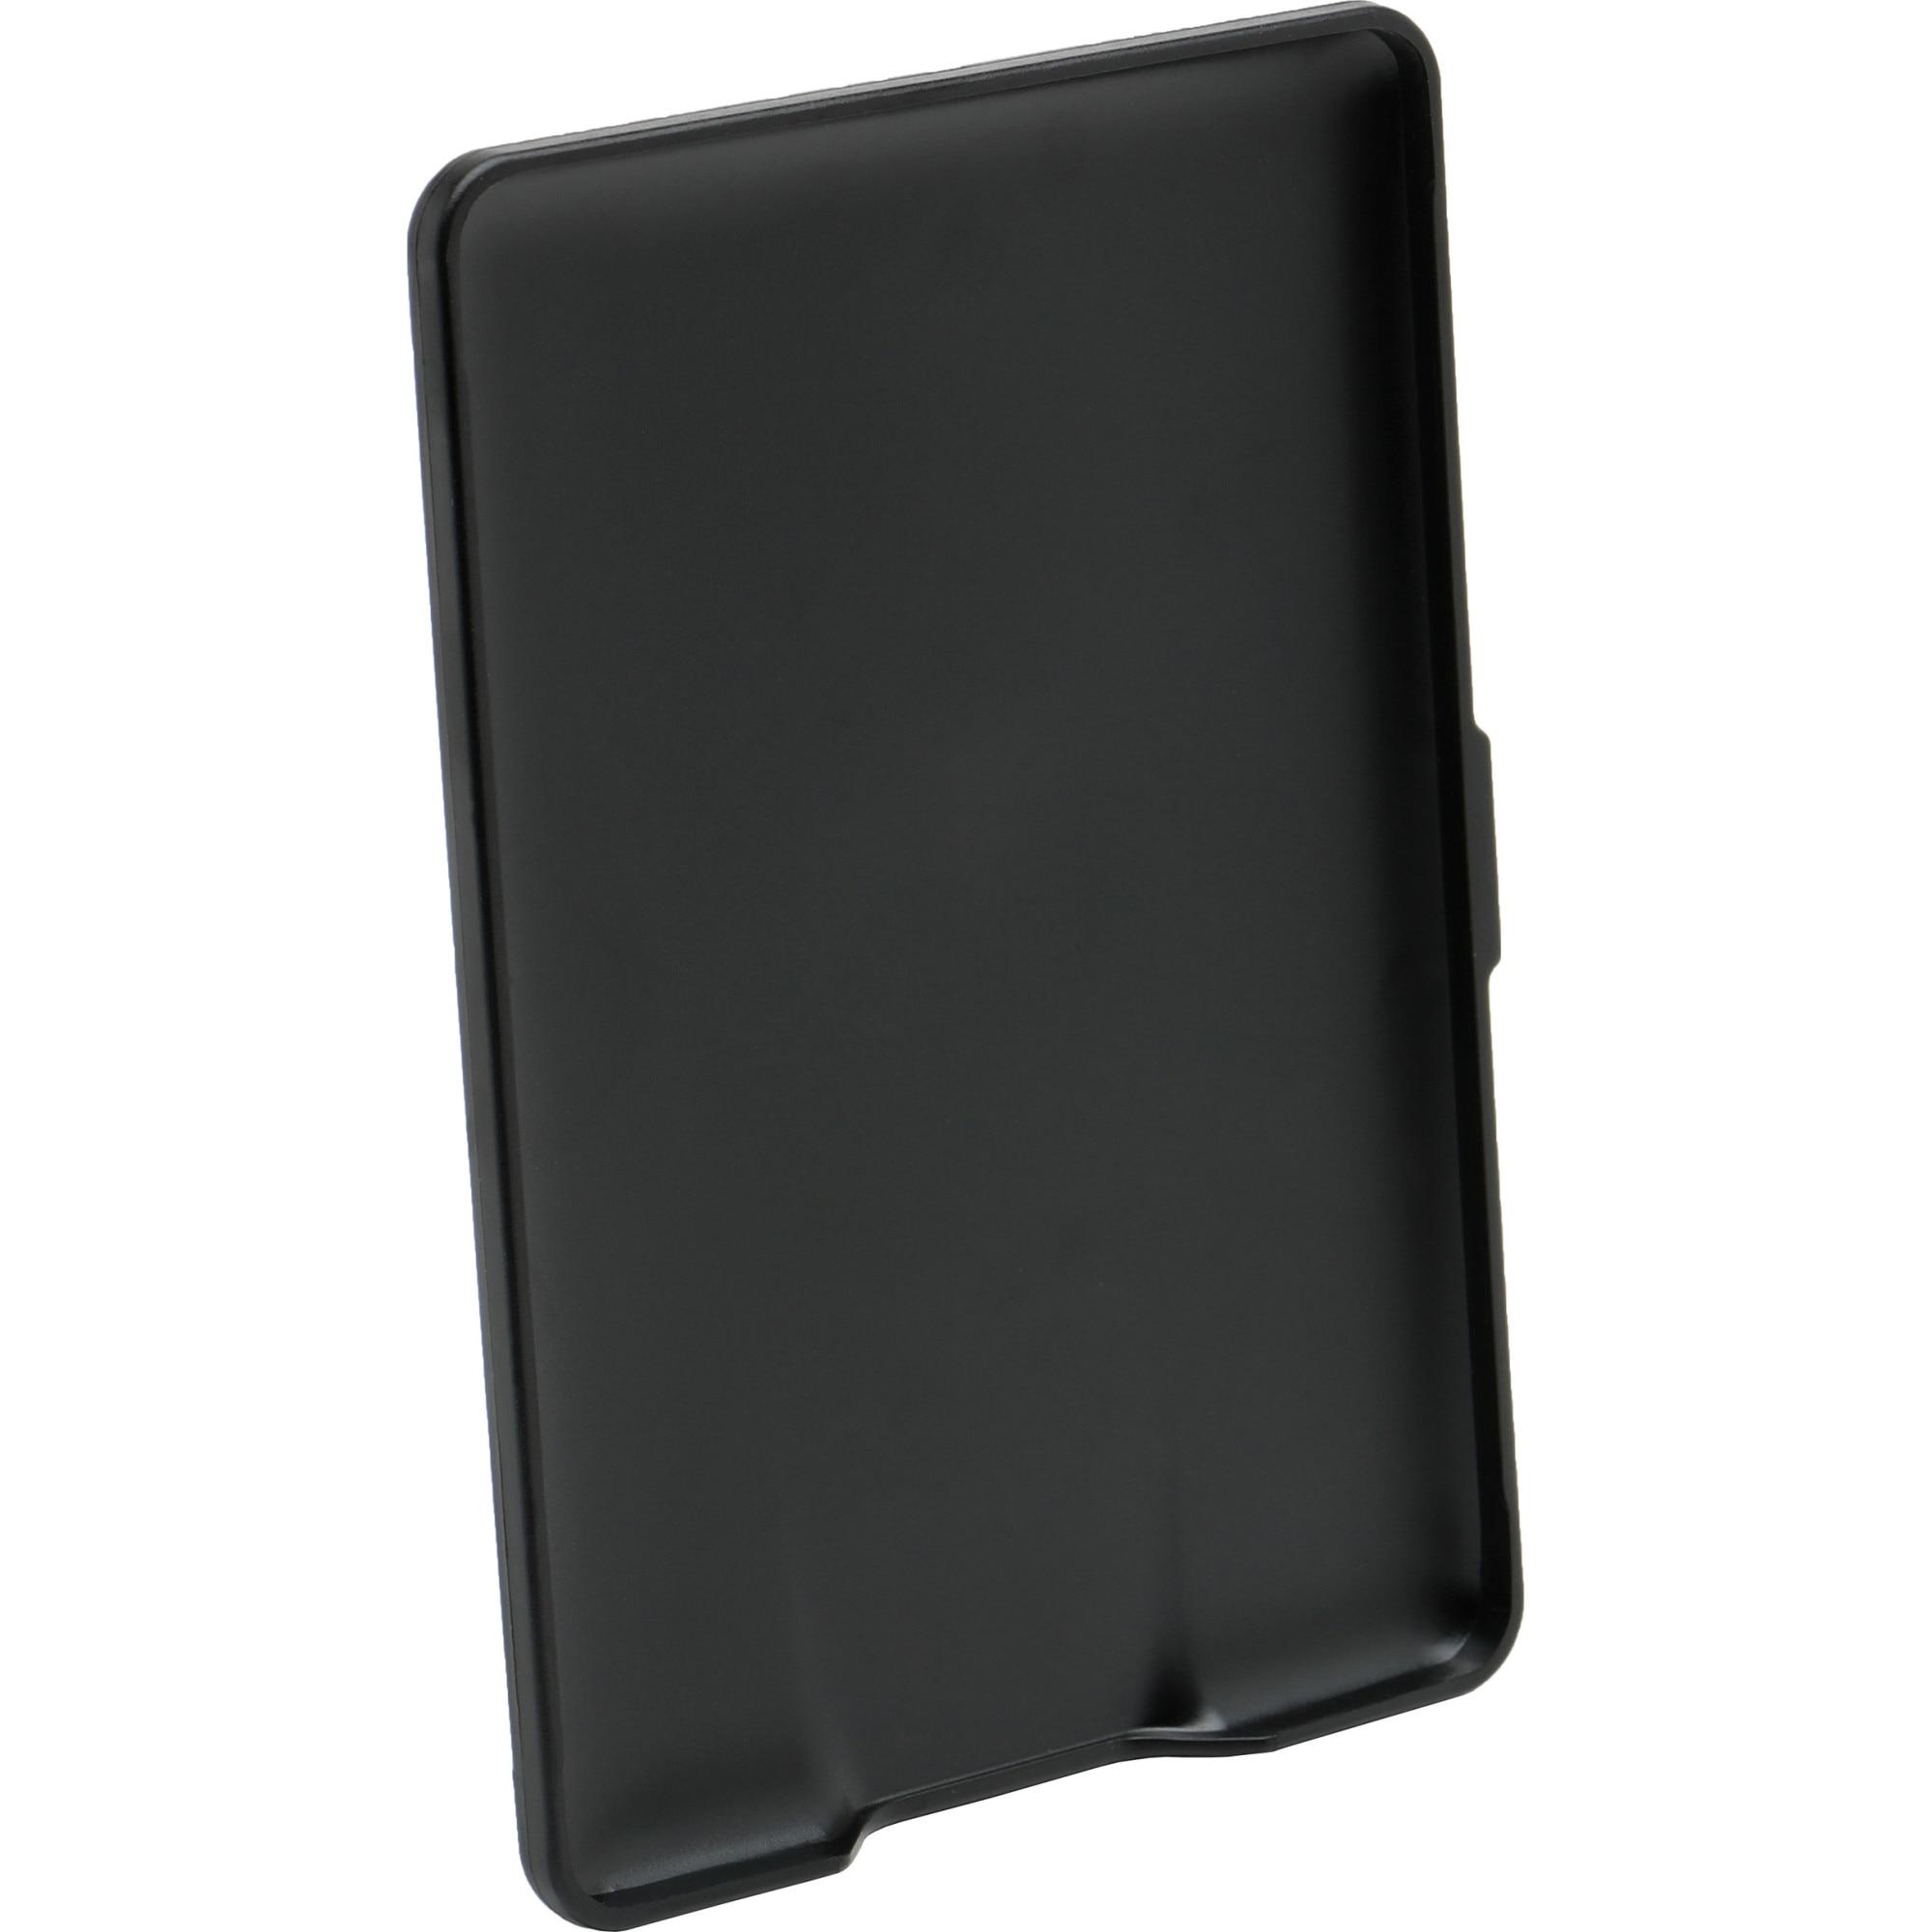 Fotografie Husa de protectie A+ Slim pentru Kindle Paperwhite, (7th Generation), Hand